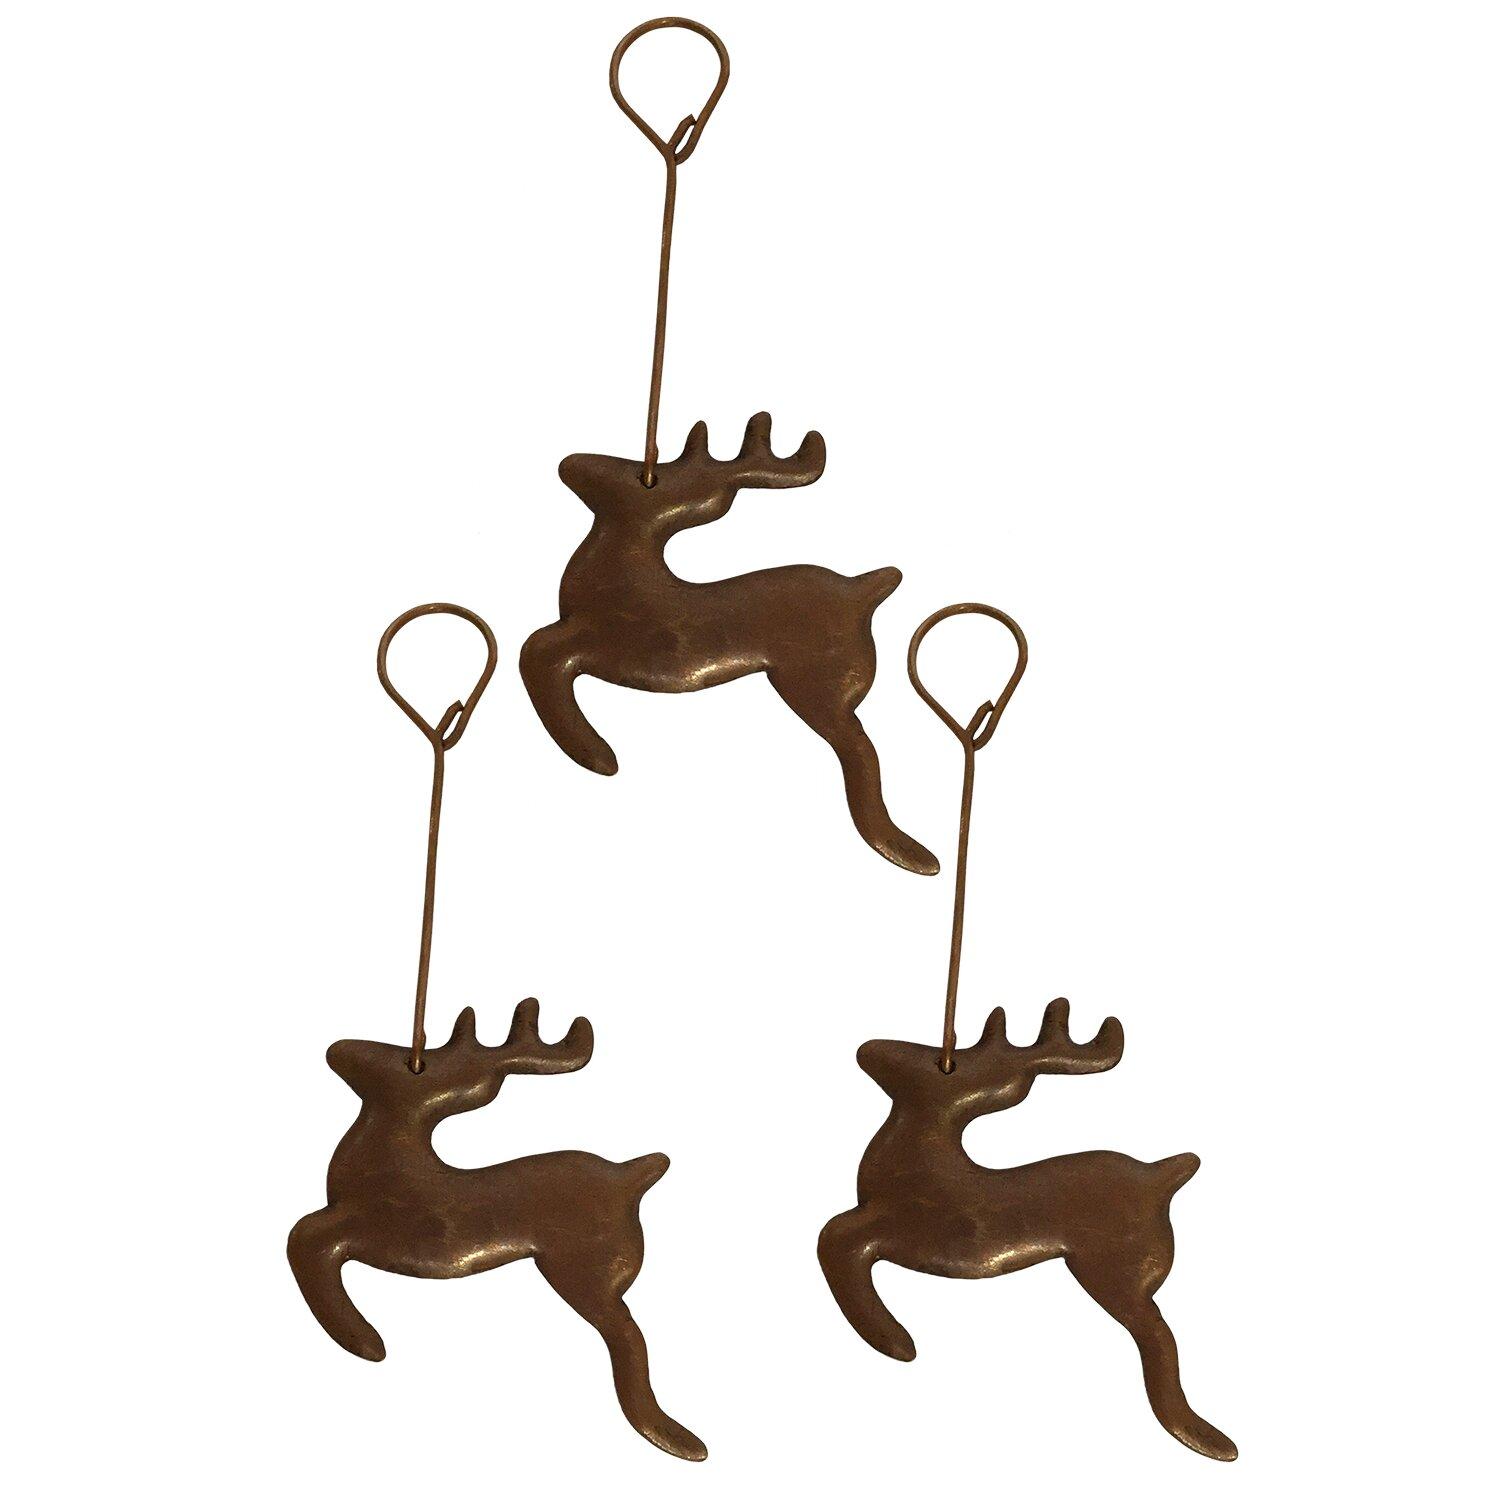 Reindeer christmas ornaments - Premier Copper Products Hand Hammered Copper Reindeer Christmas Ornament